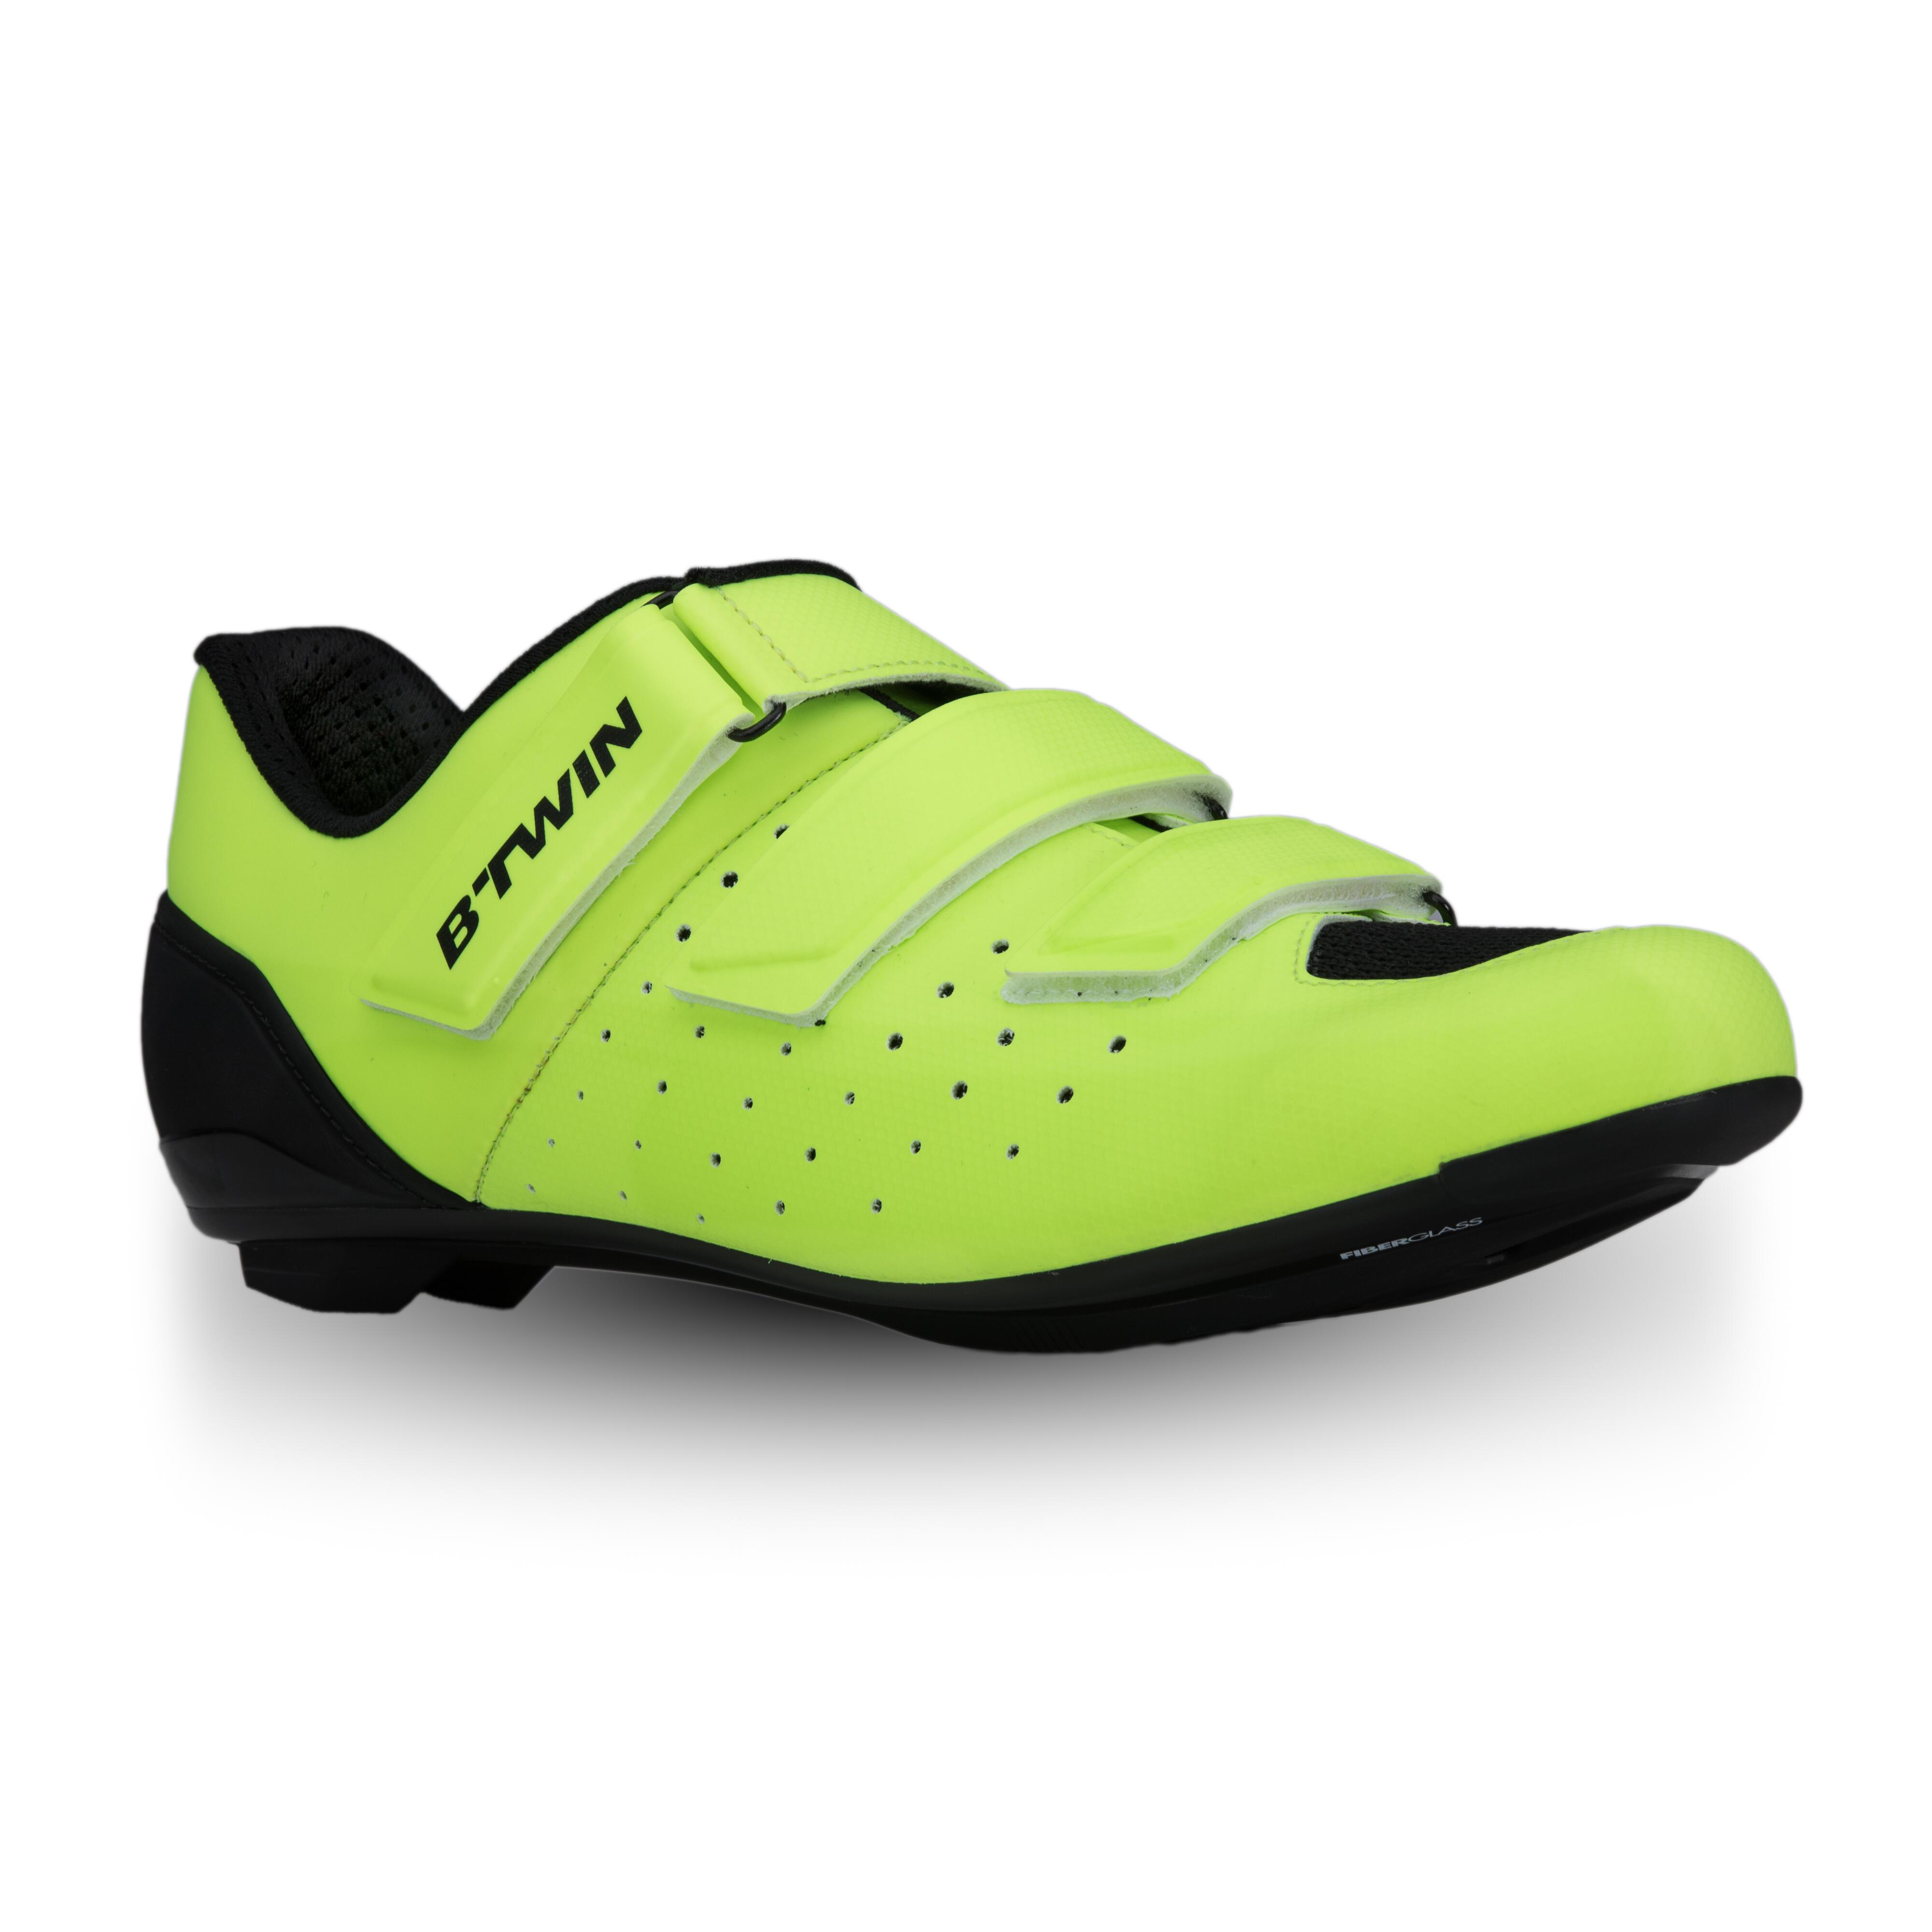 Fahrrad-Schuhe Rennrad RR 500 neongelb | Schuhe > Sportschuhe > Fahrradschuhe | Gelb | B´twin